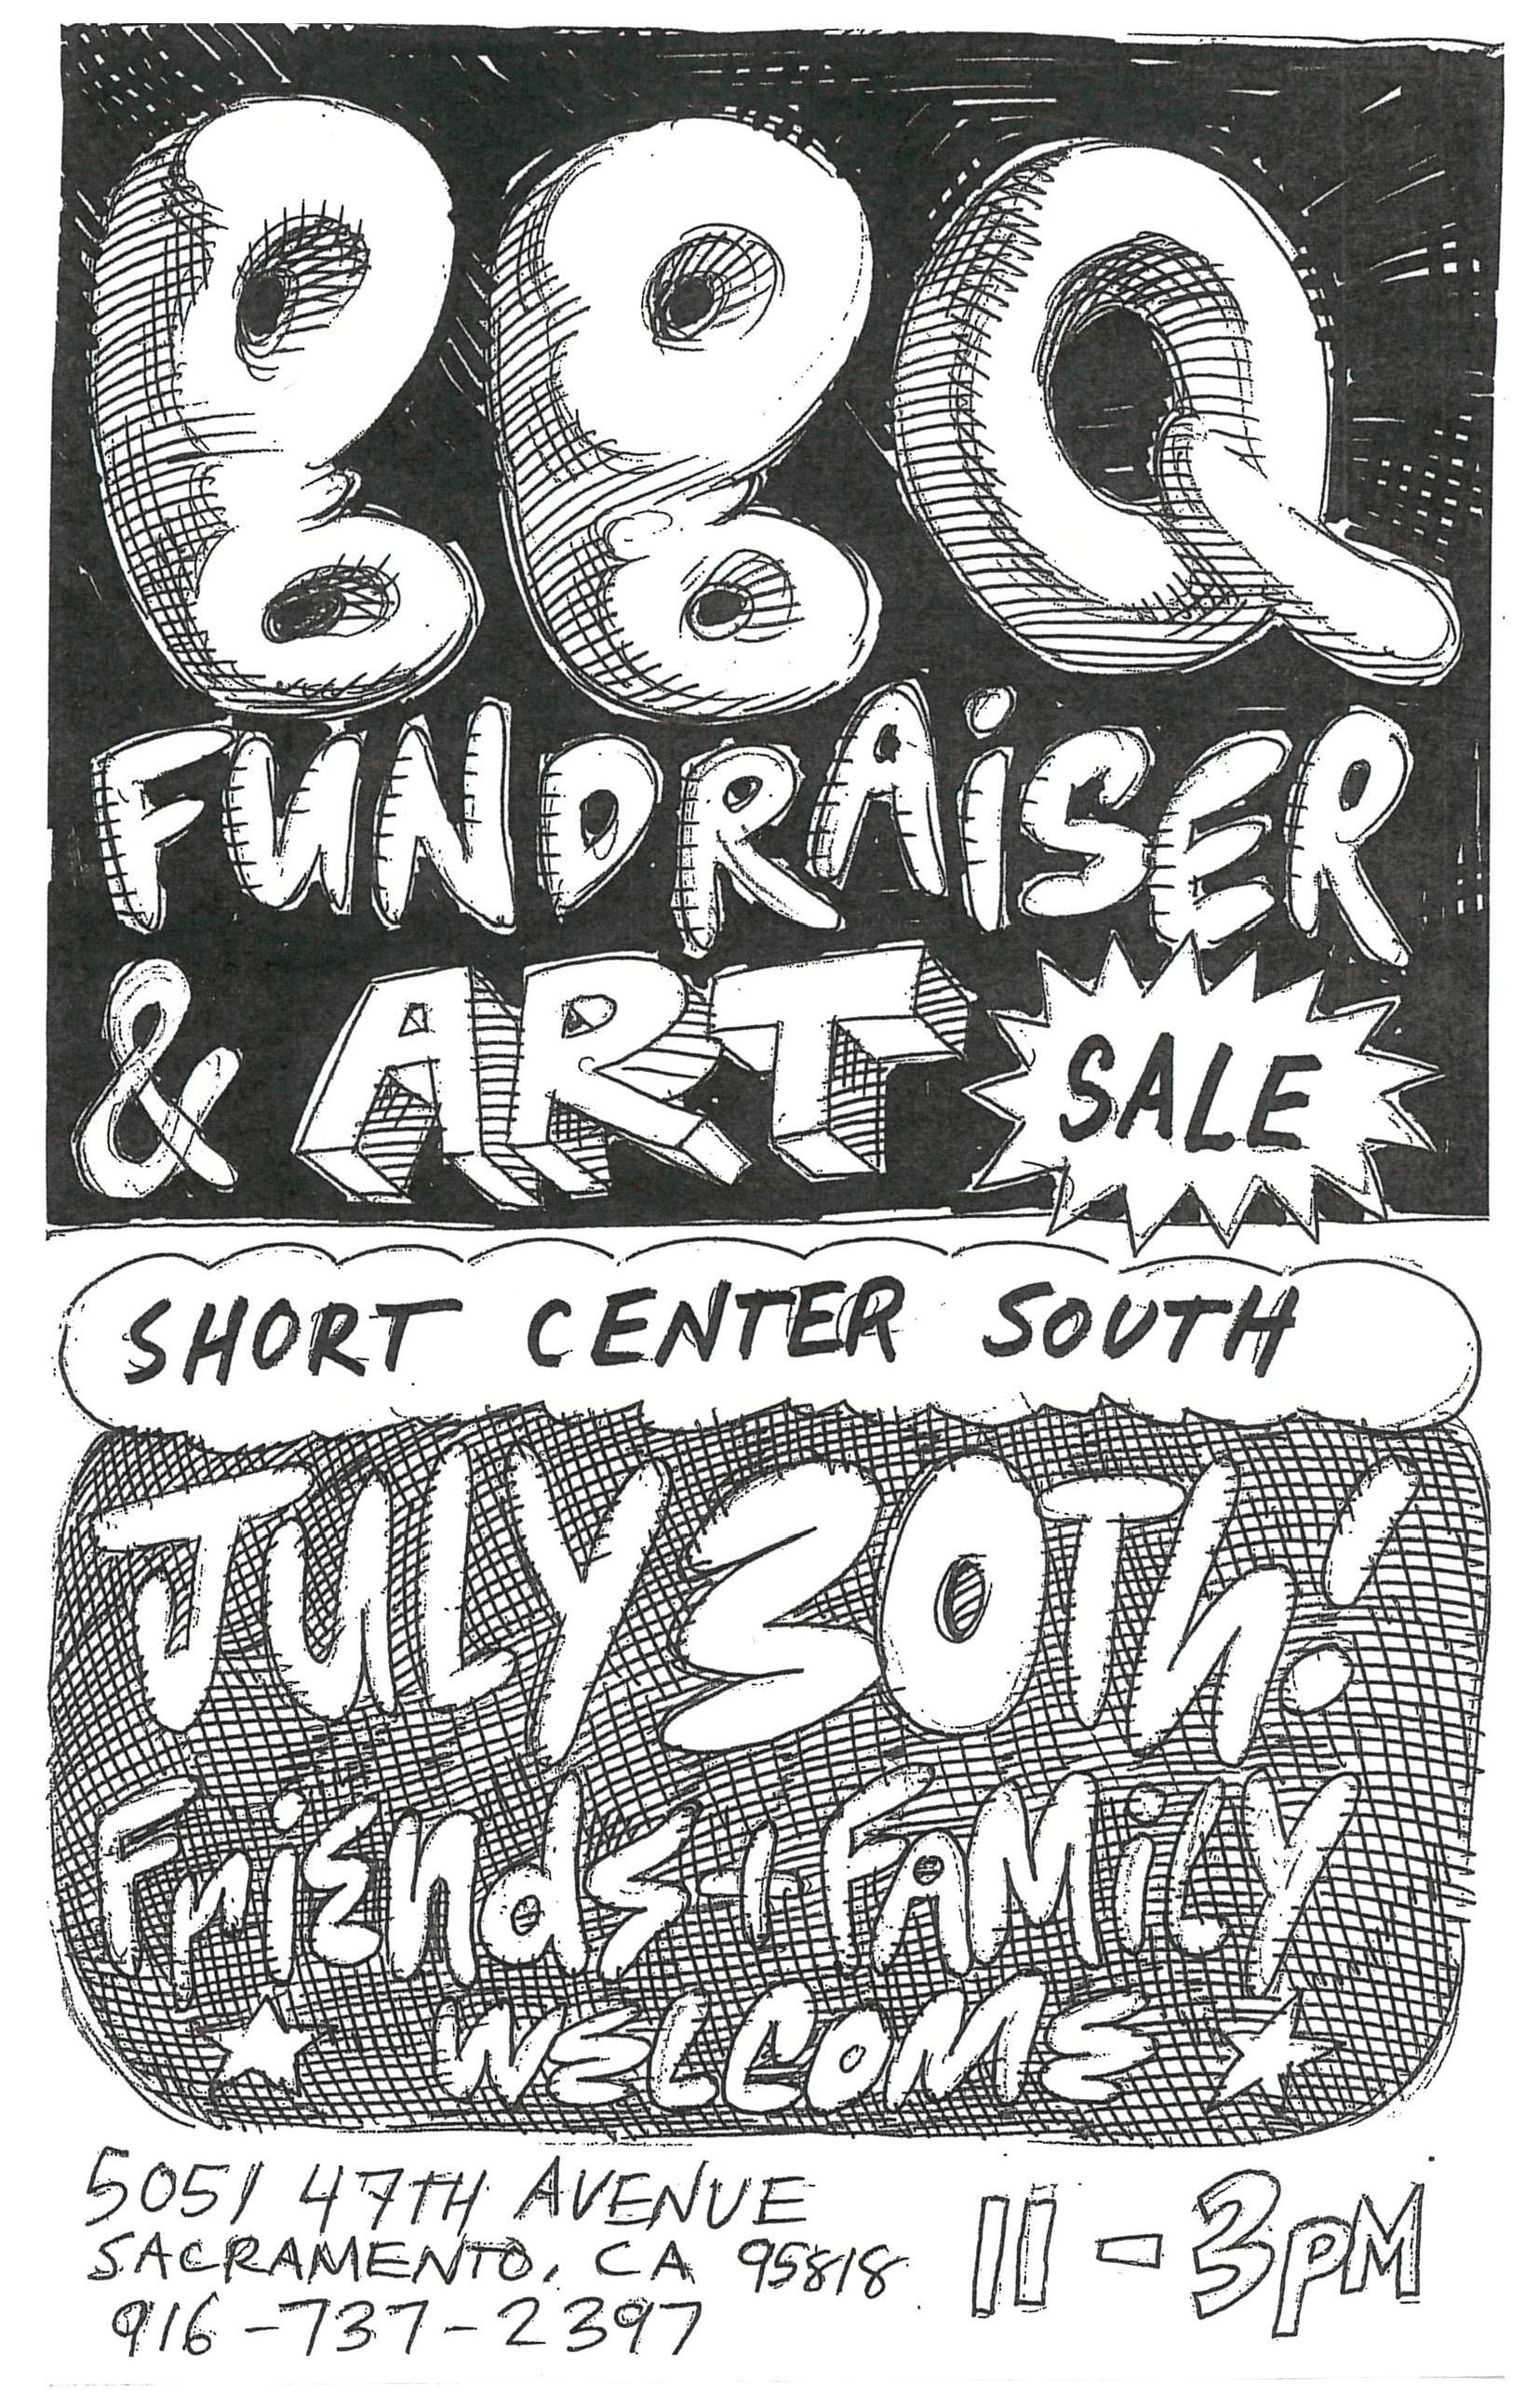 SCS BBQ & Art Sale 2016